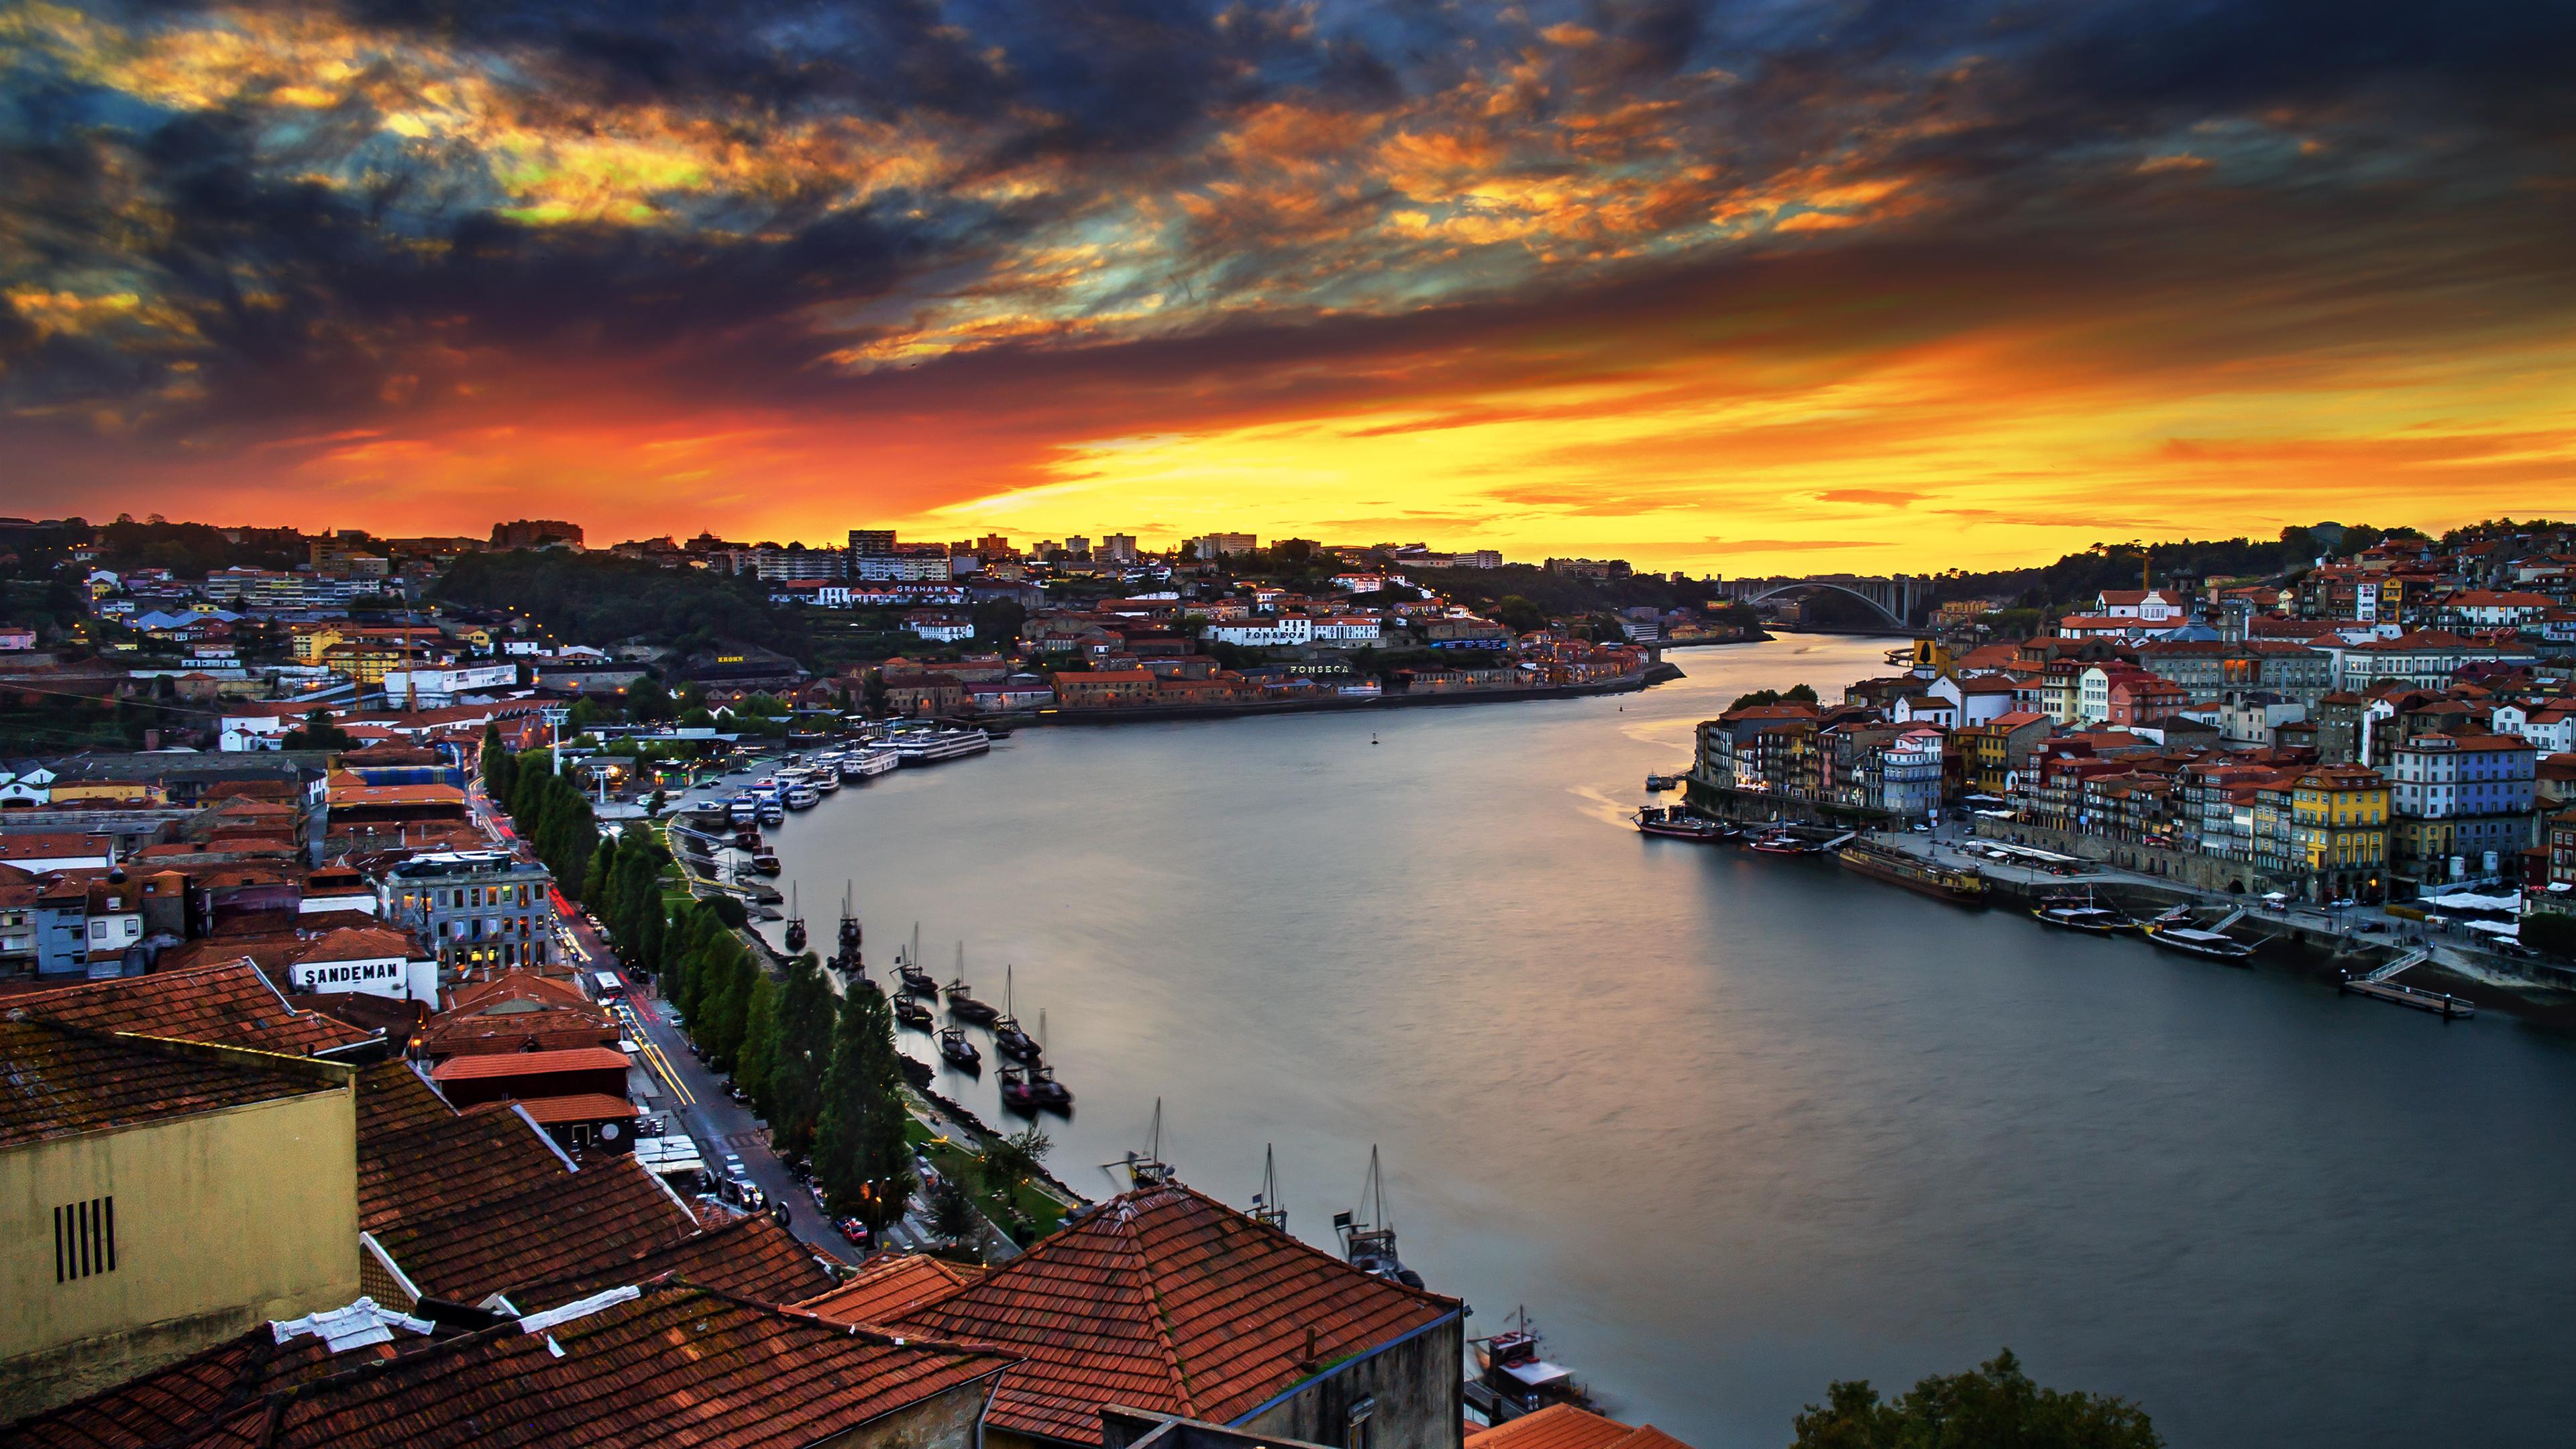 portugal wallpaper - photo #9